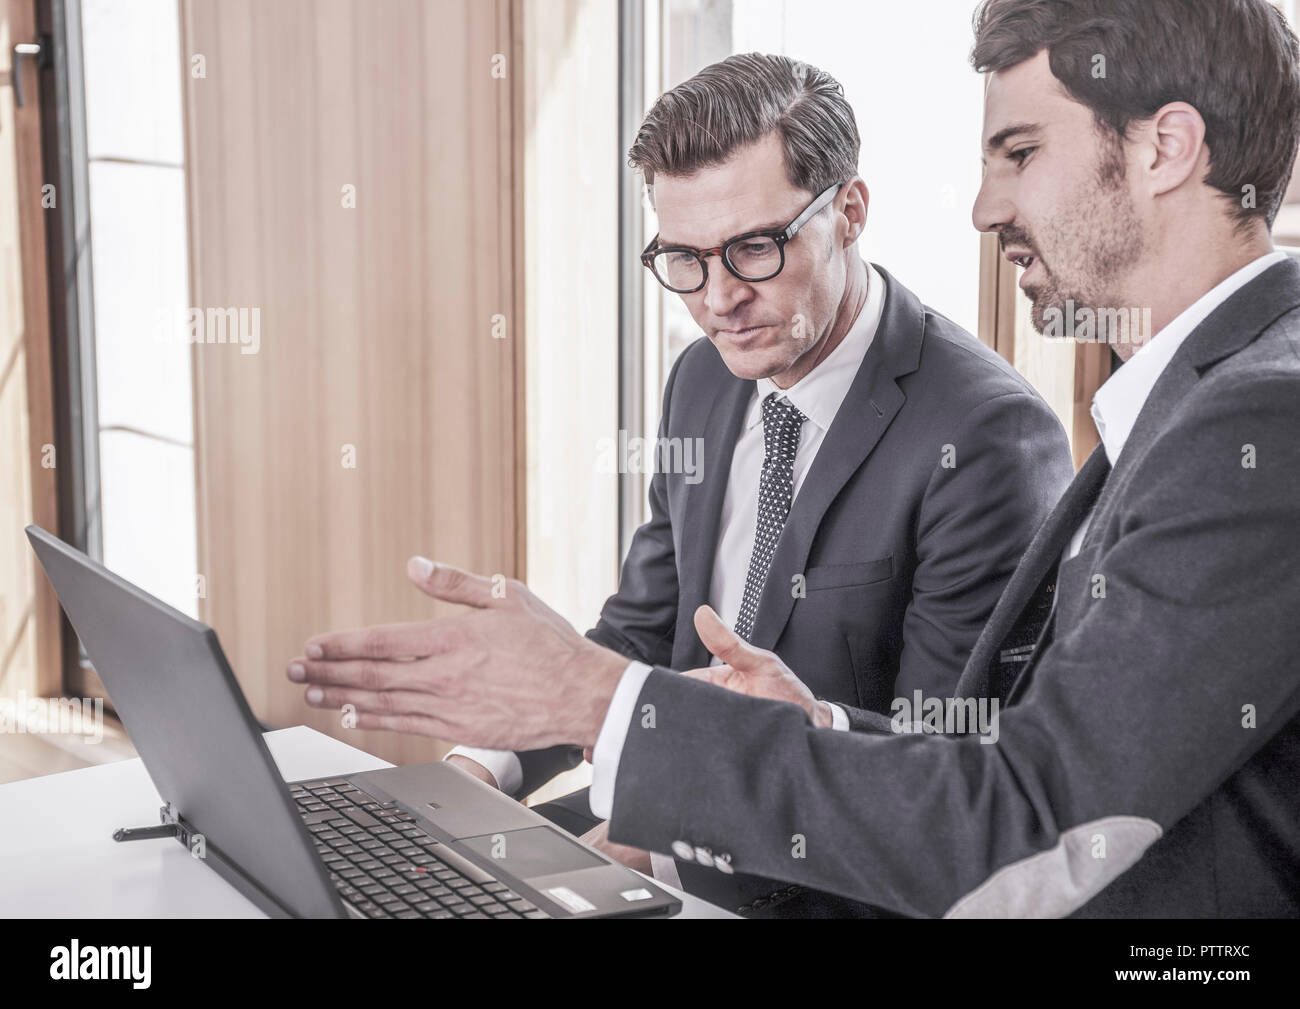 Zwei Maenner arbeiten an Laptop (model-released) - Stock Image